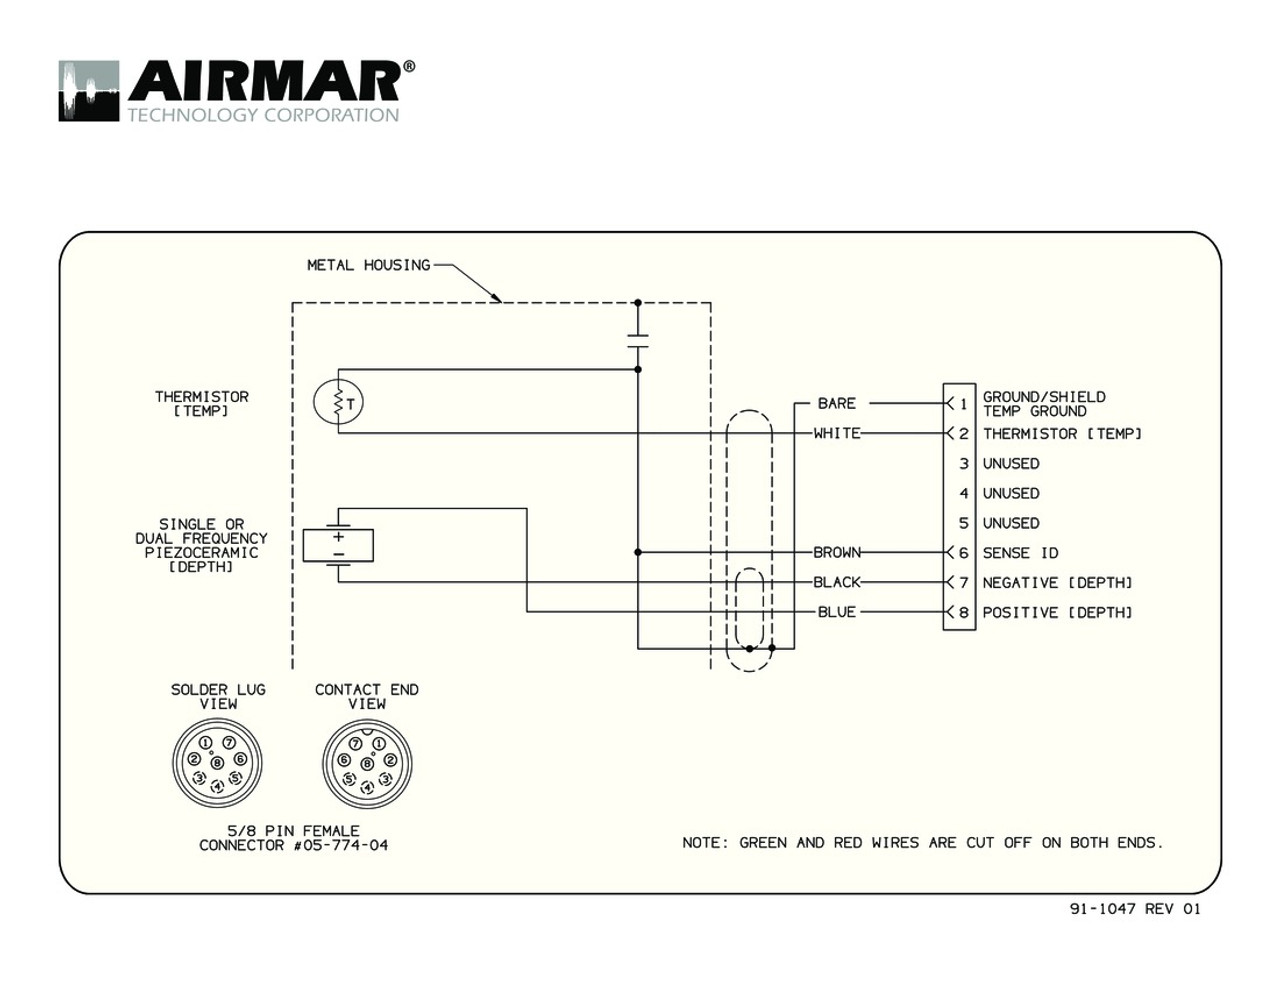 hight resolution of airmar wiring diagram garmin b117 8 pin d t blue bottle marine wiring diagram for garmin fishfinder 90 wiring diagram garmin